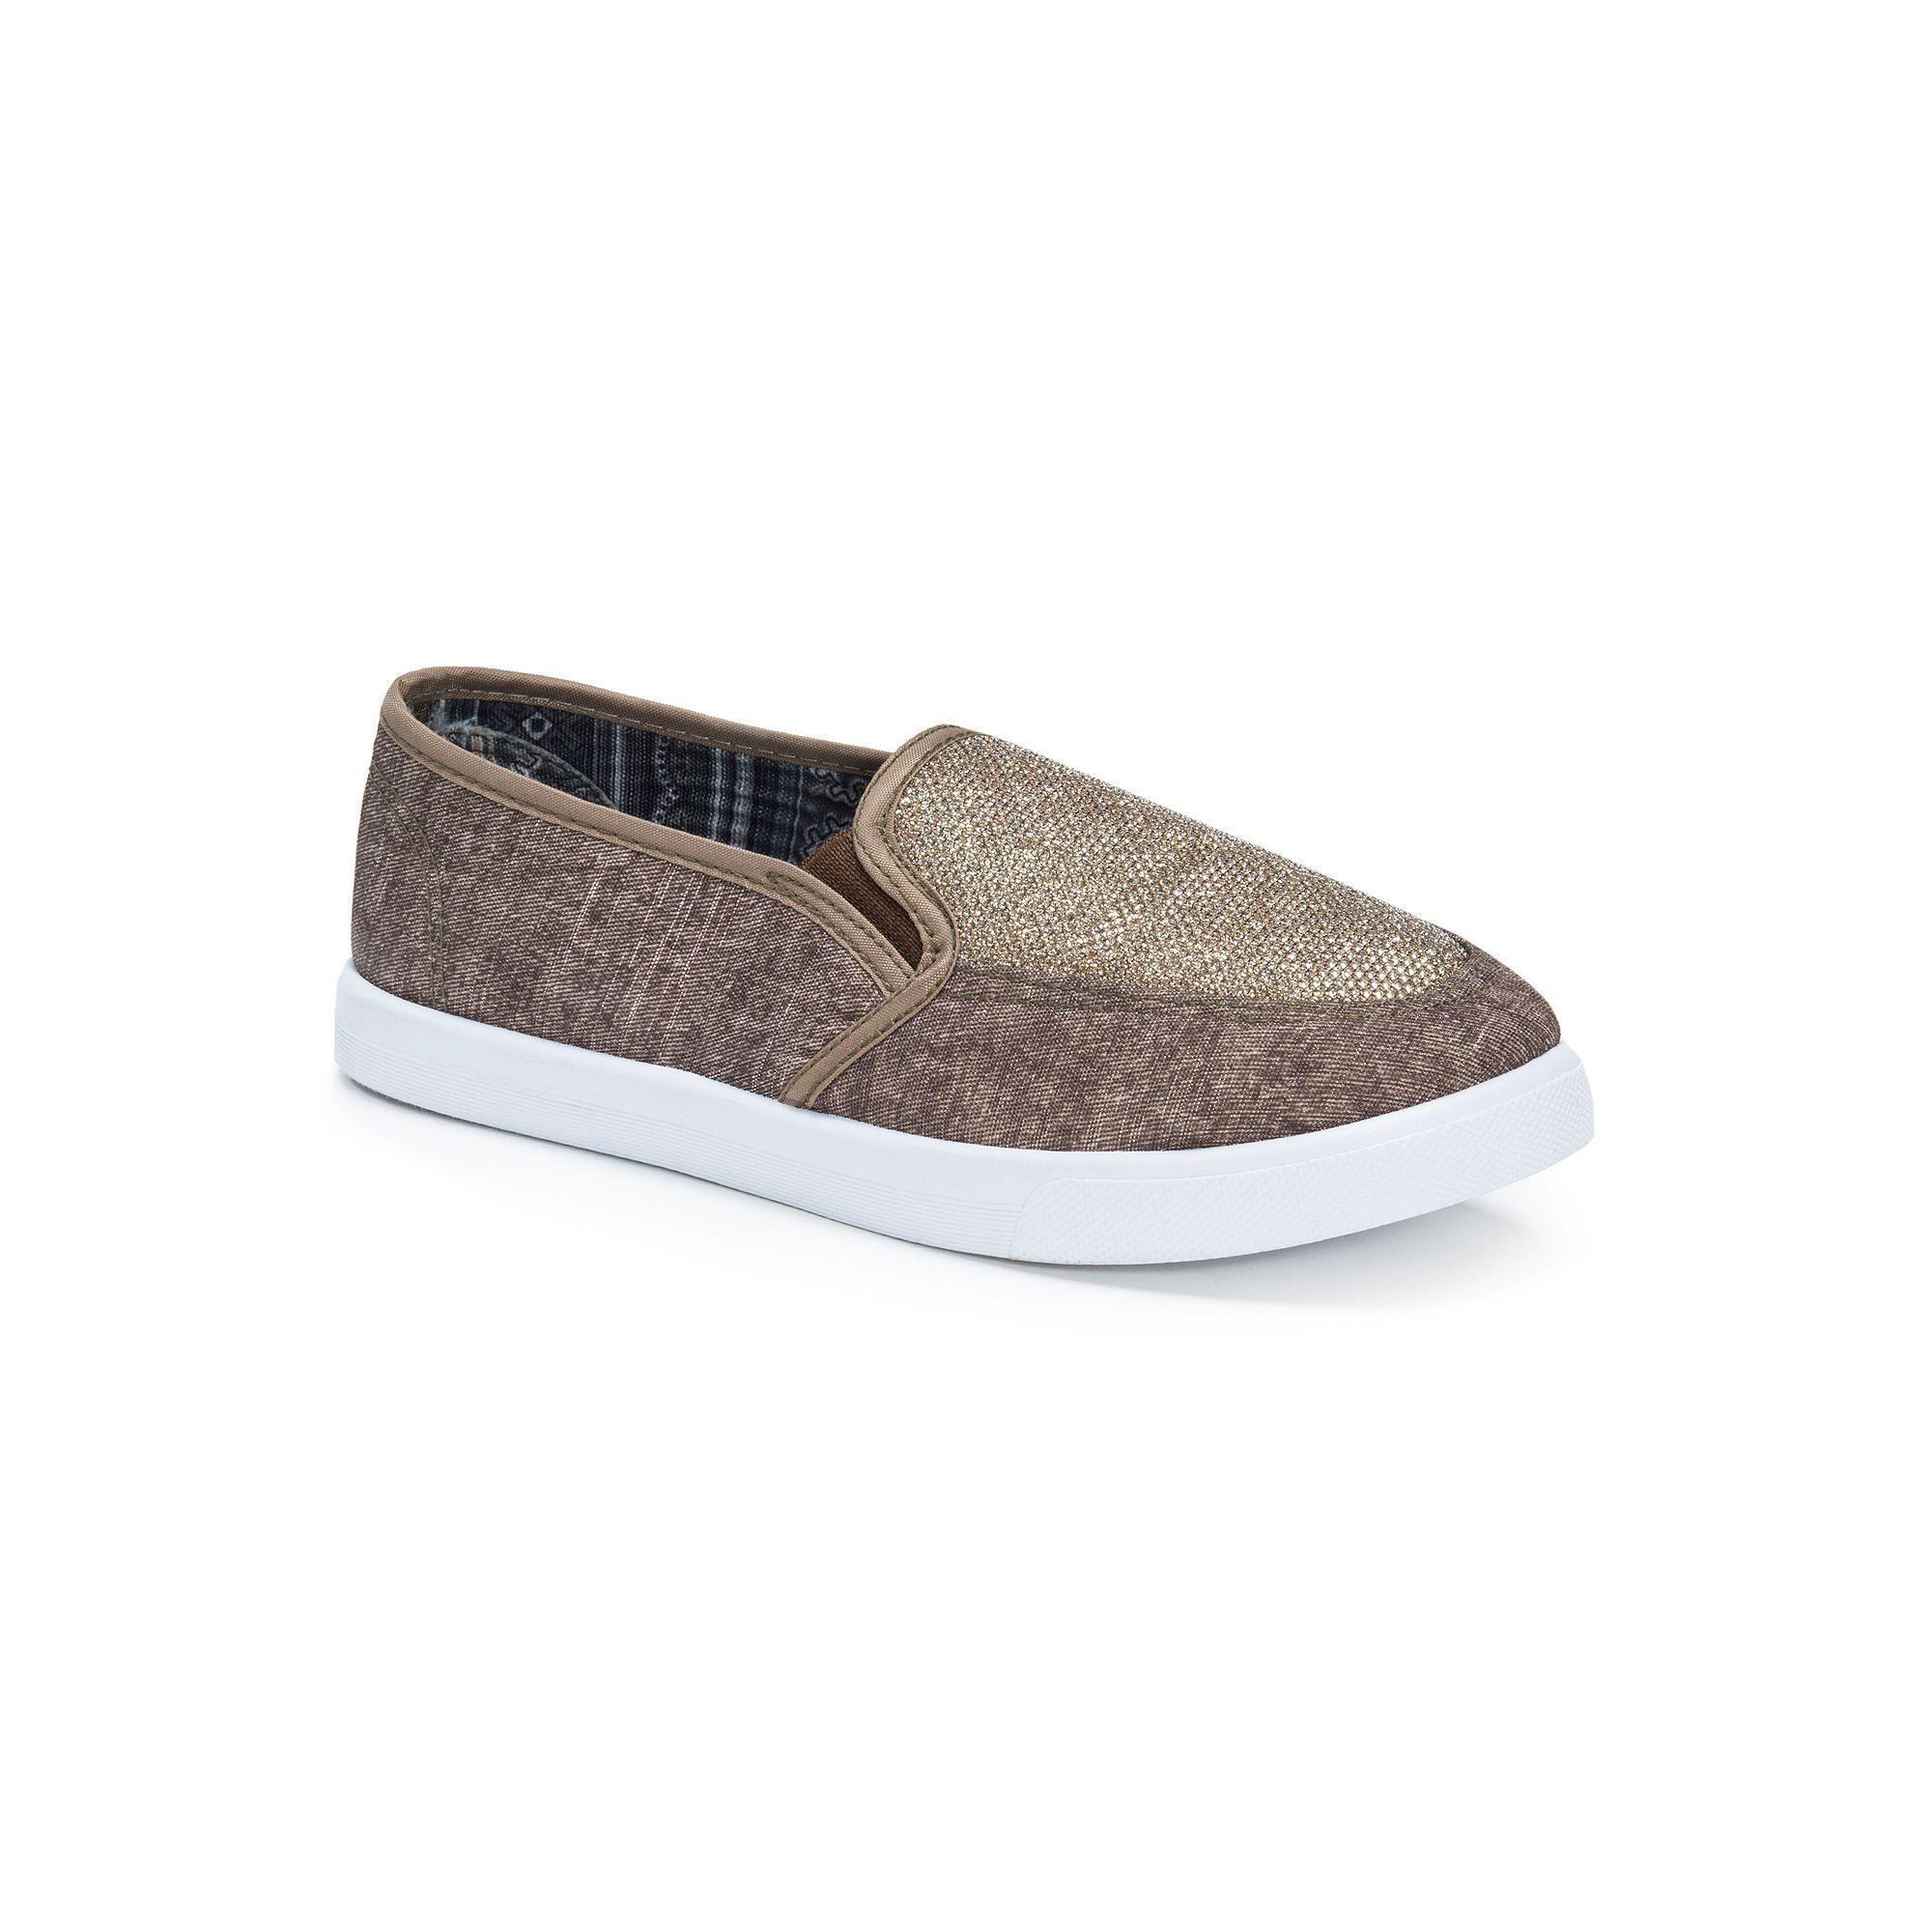 fb091e1c19f4d6 Most Simple Tips  Chanel Shoes Pumps louboutin shoes women.Shoes Cabinet  Bedroom shoes sketch hayden williams.Shoe Tenis.